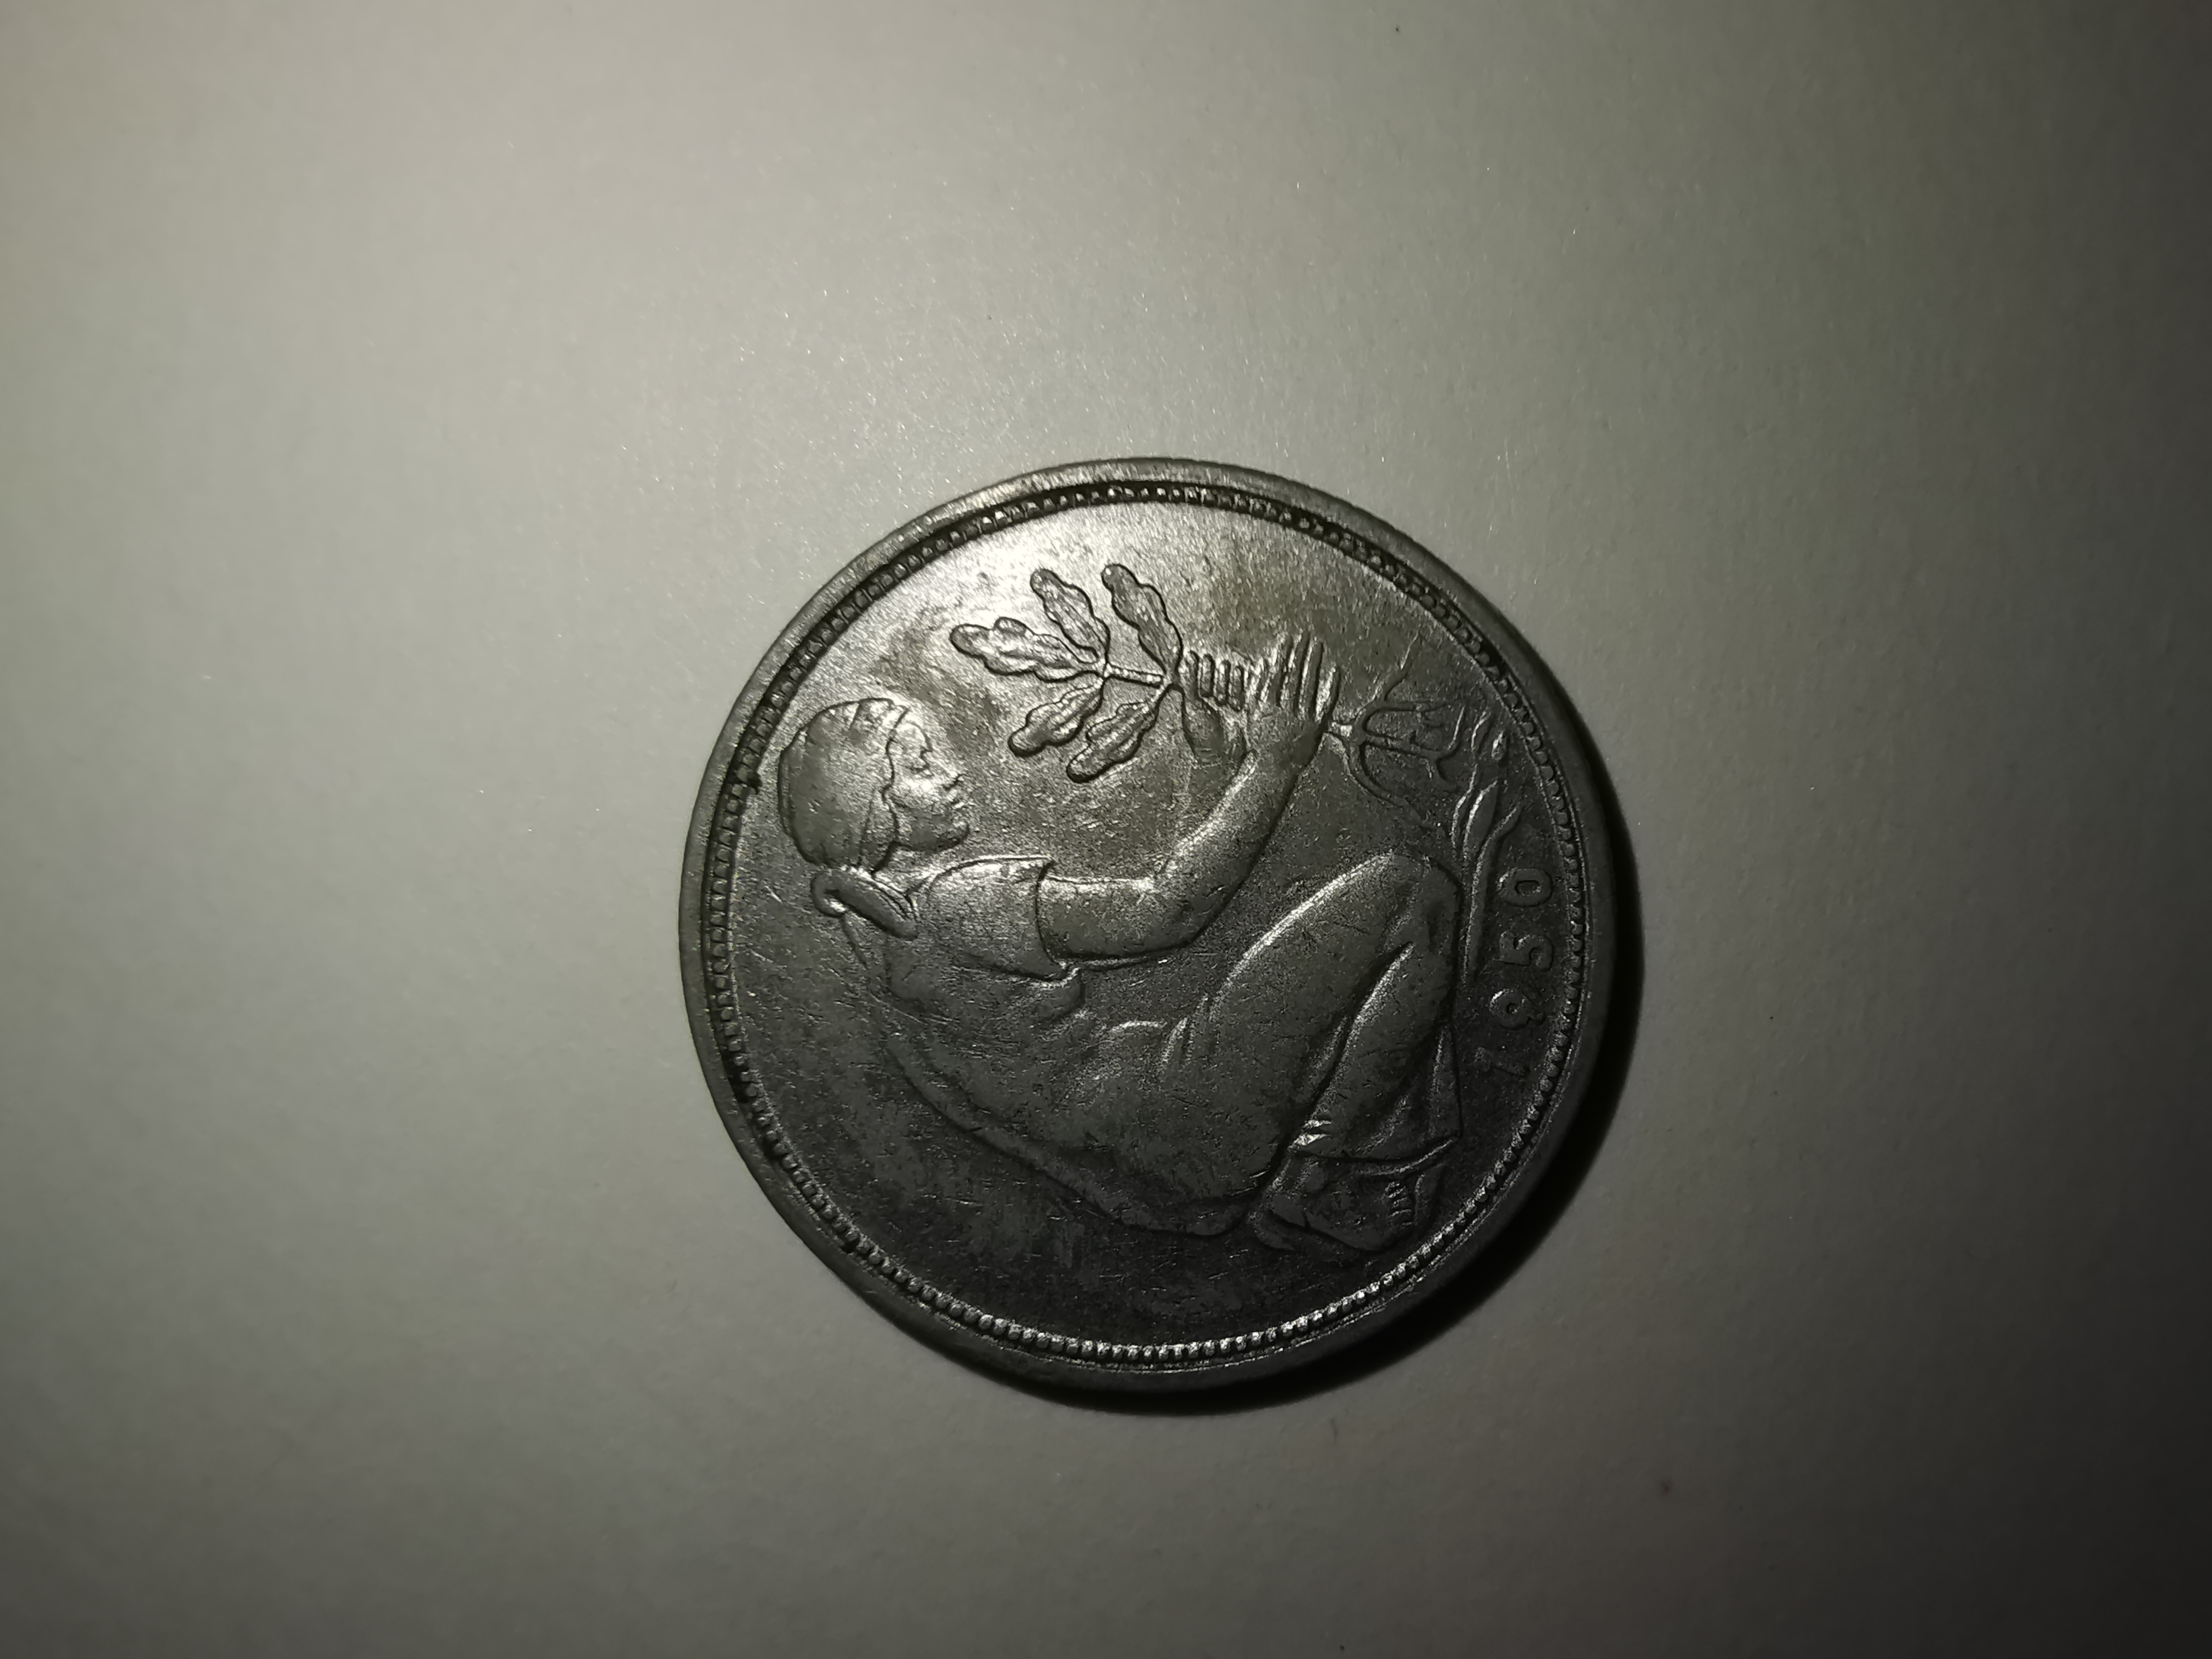 1950 50 Pfennig Fehlprägung Rückseite.jpg